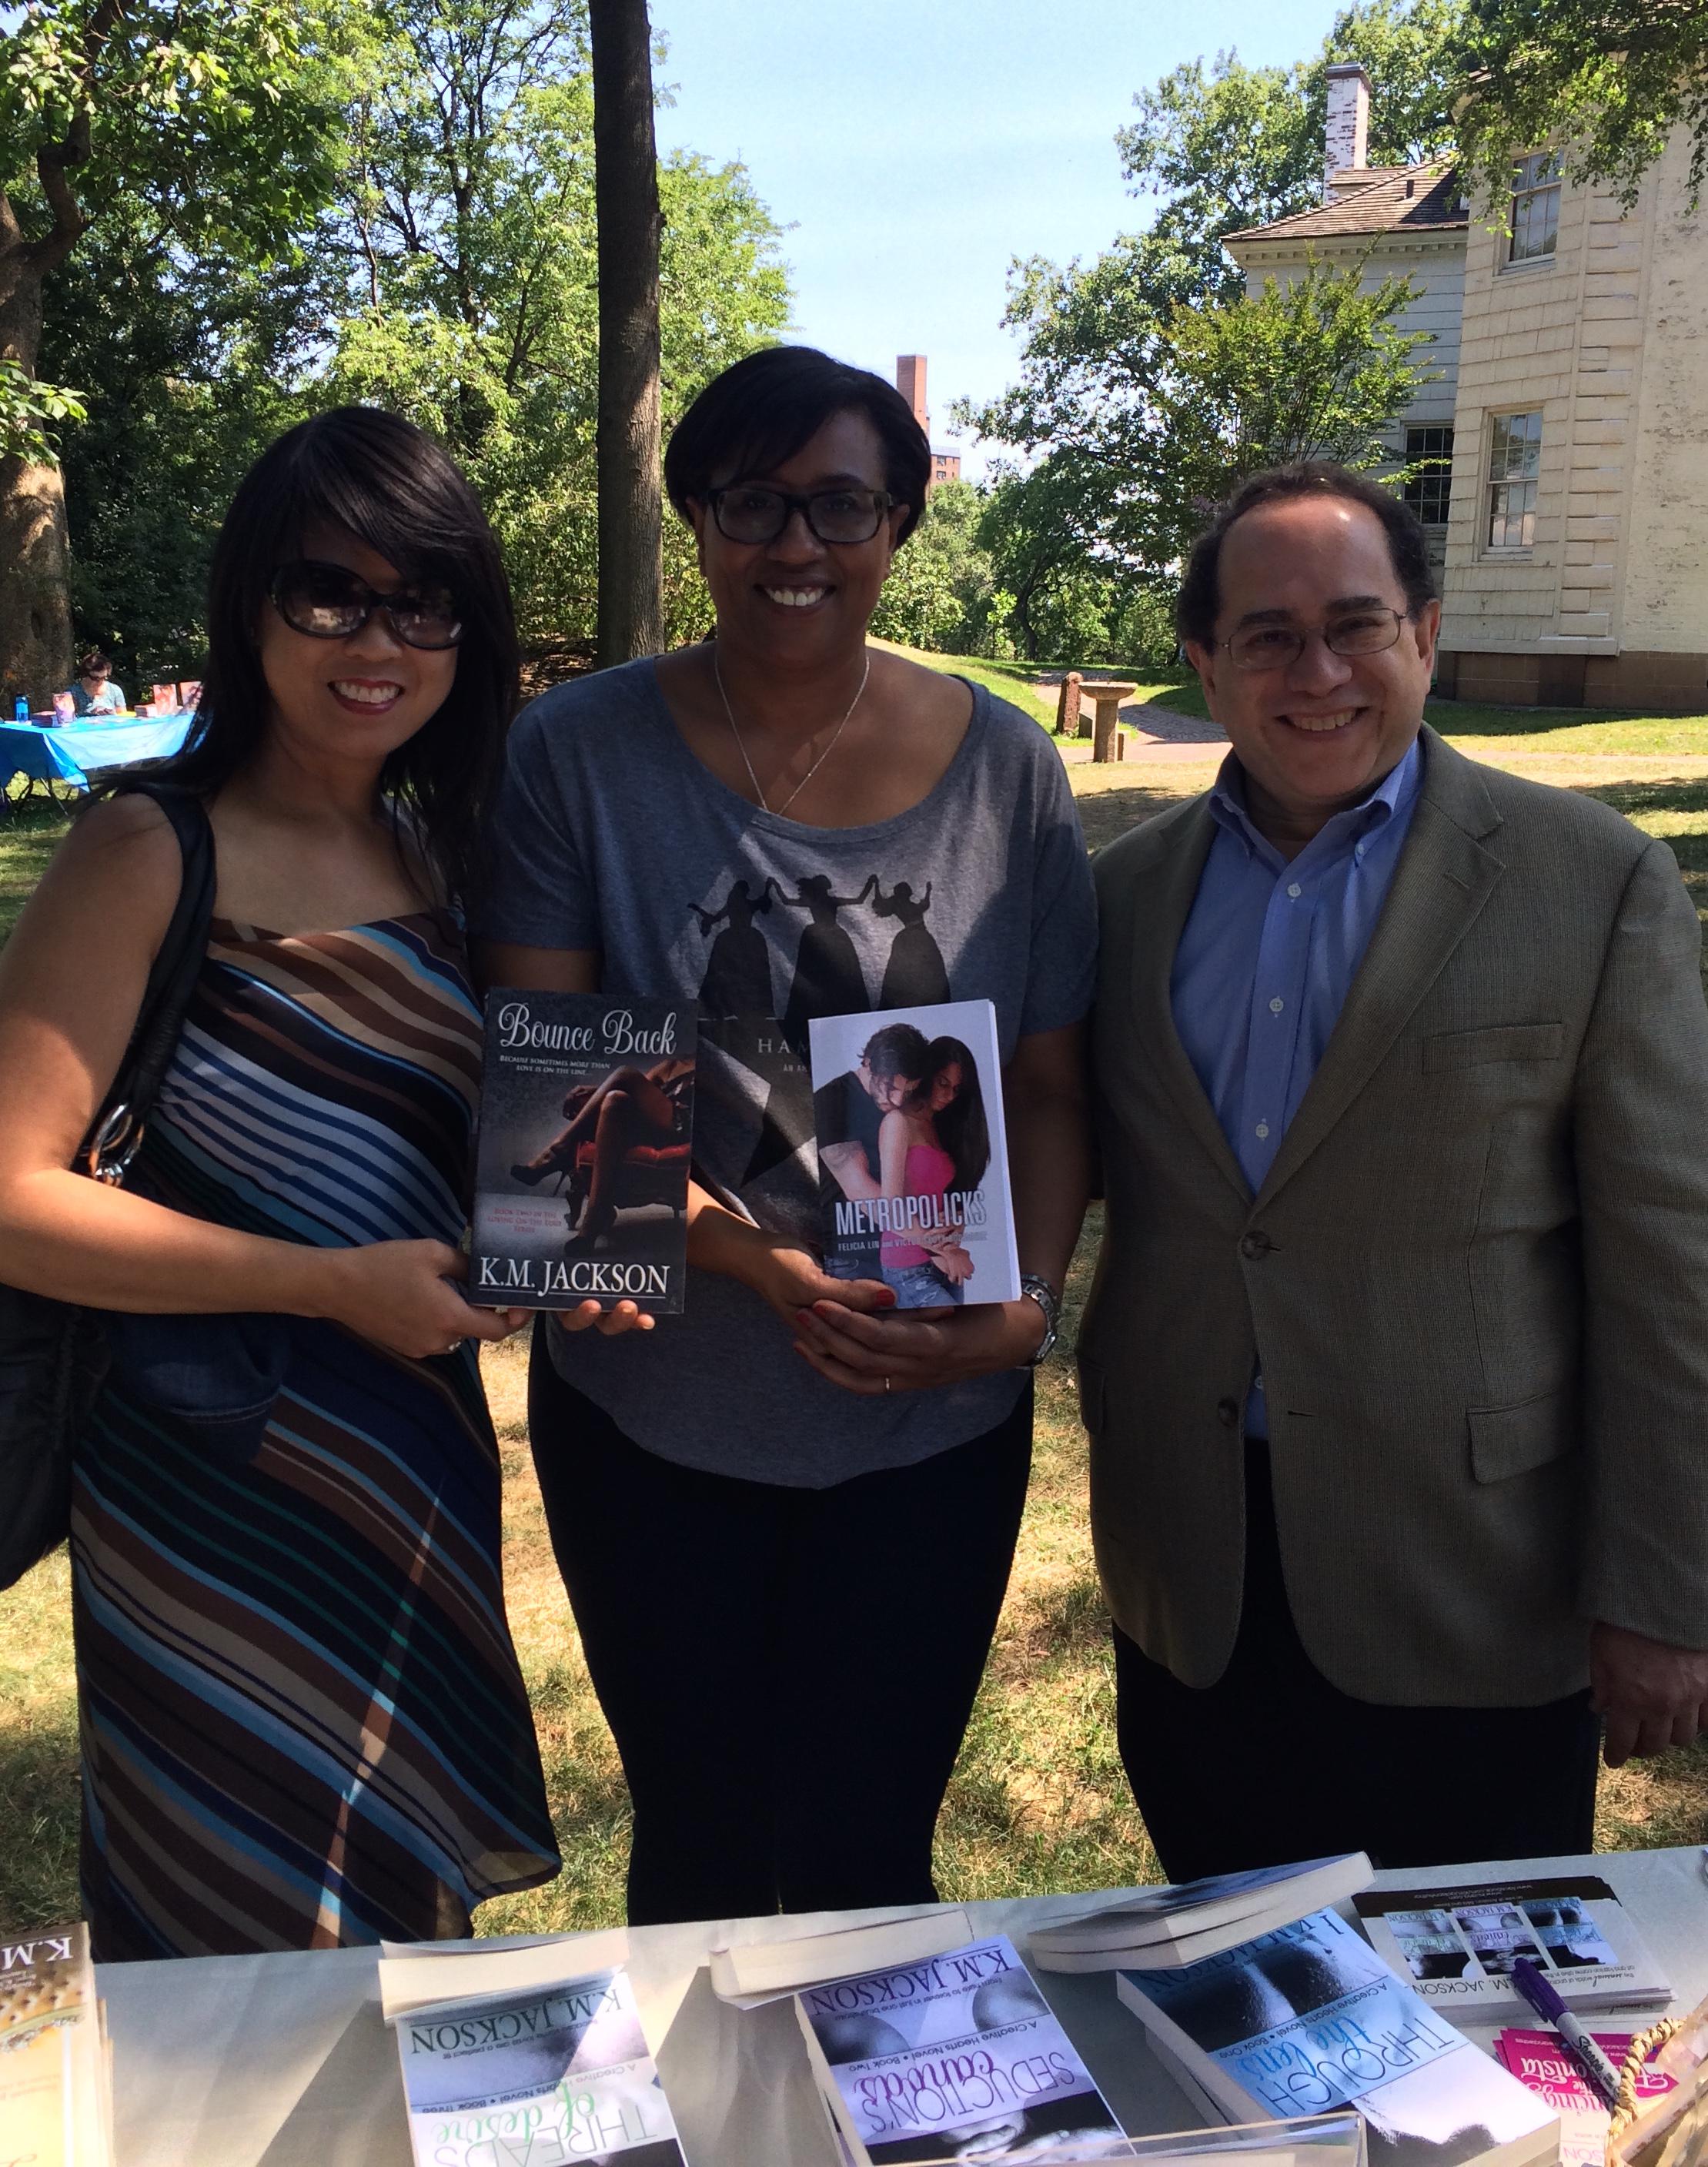 Felicia Lin, K.M. Jackson and Victor Scott Rodriguez